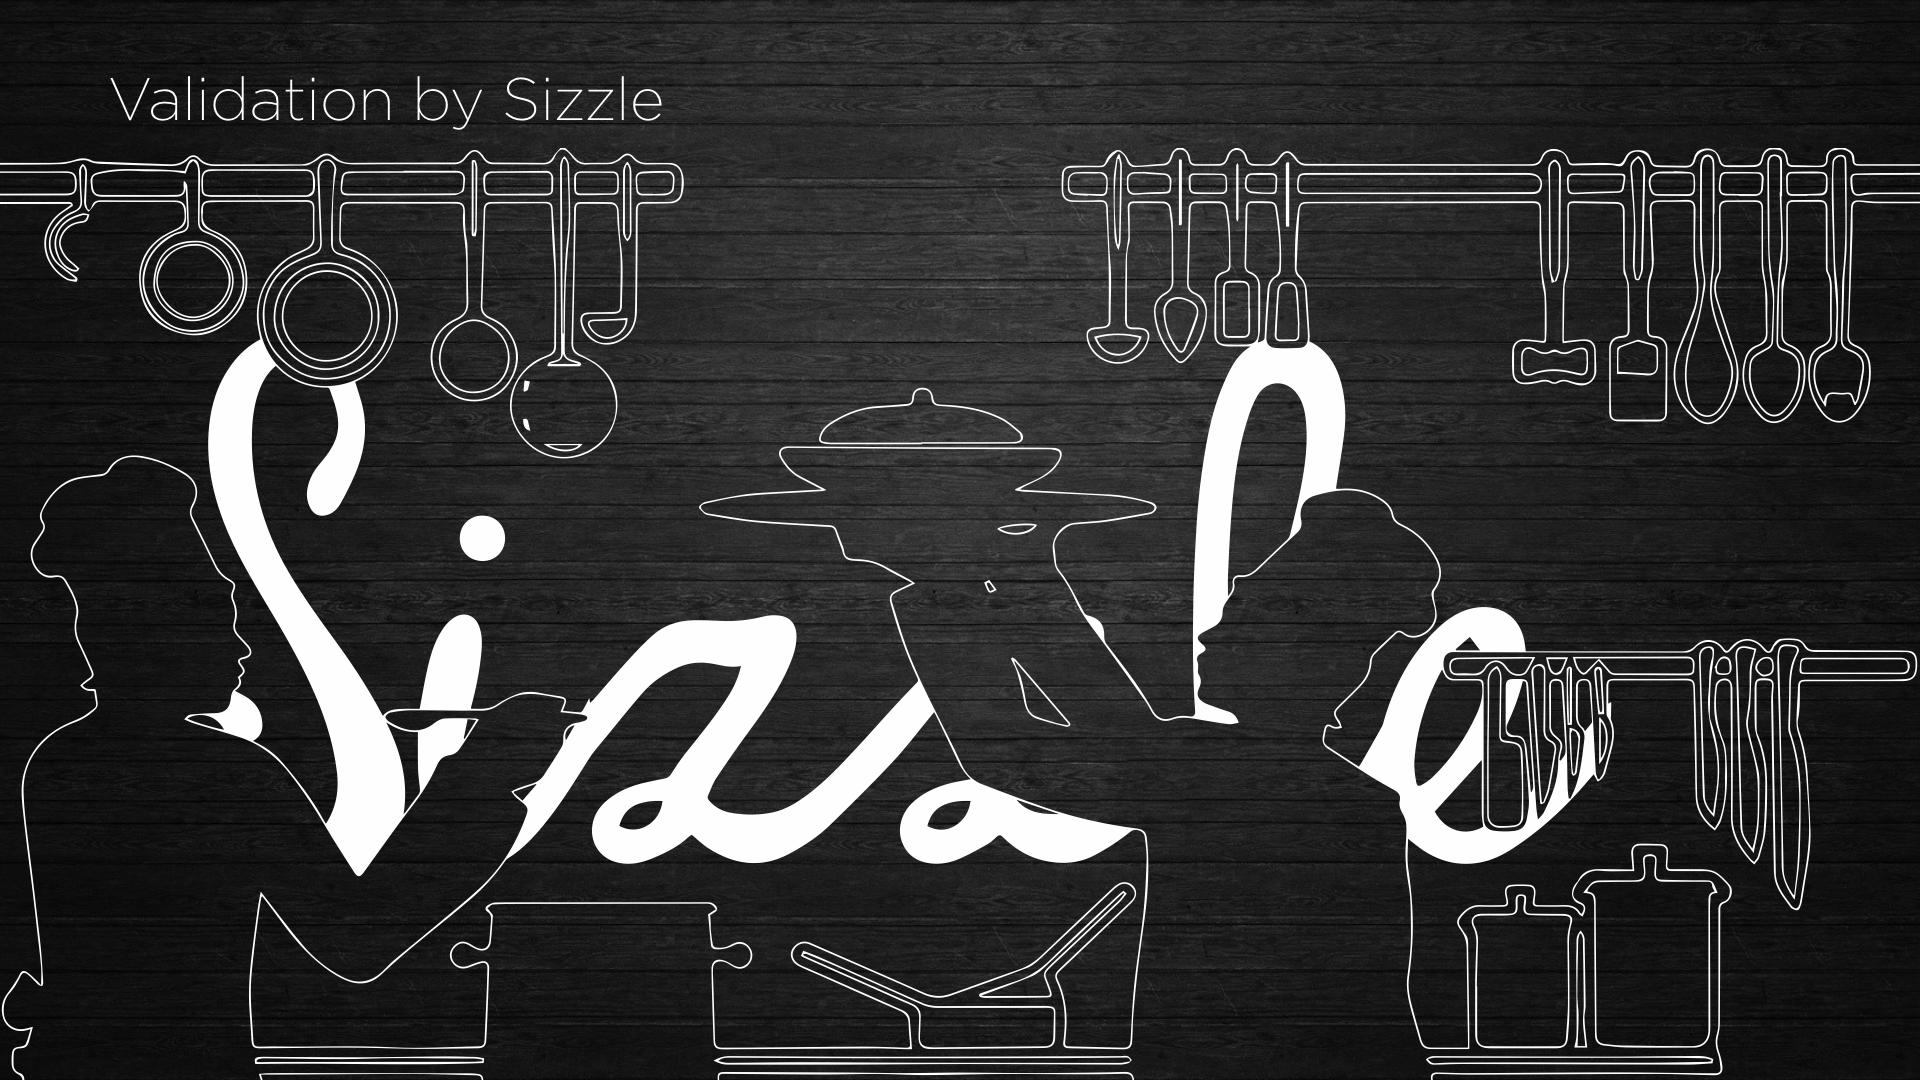 Sizzle_final_deck.015.jpeg